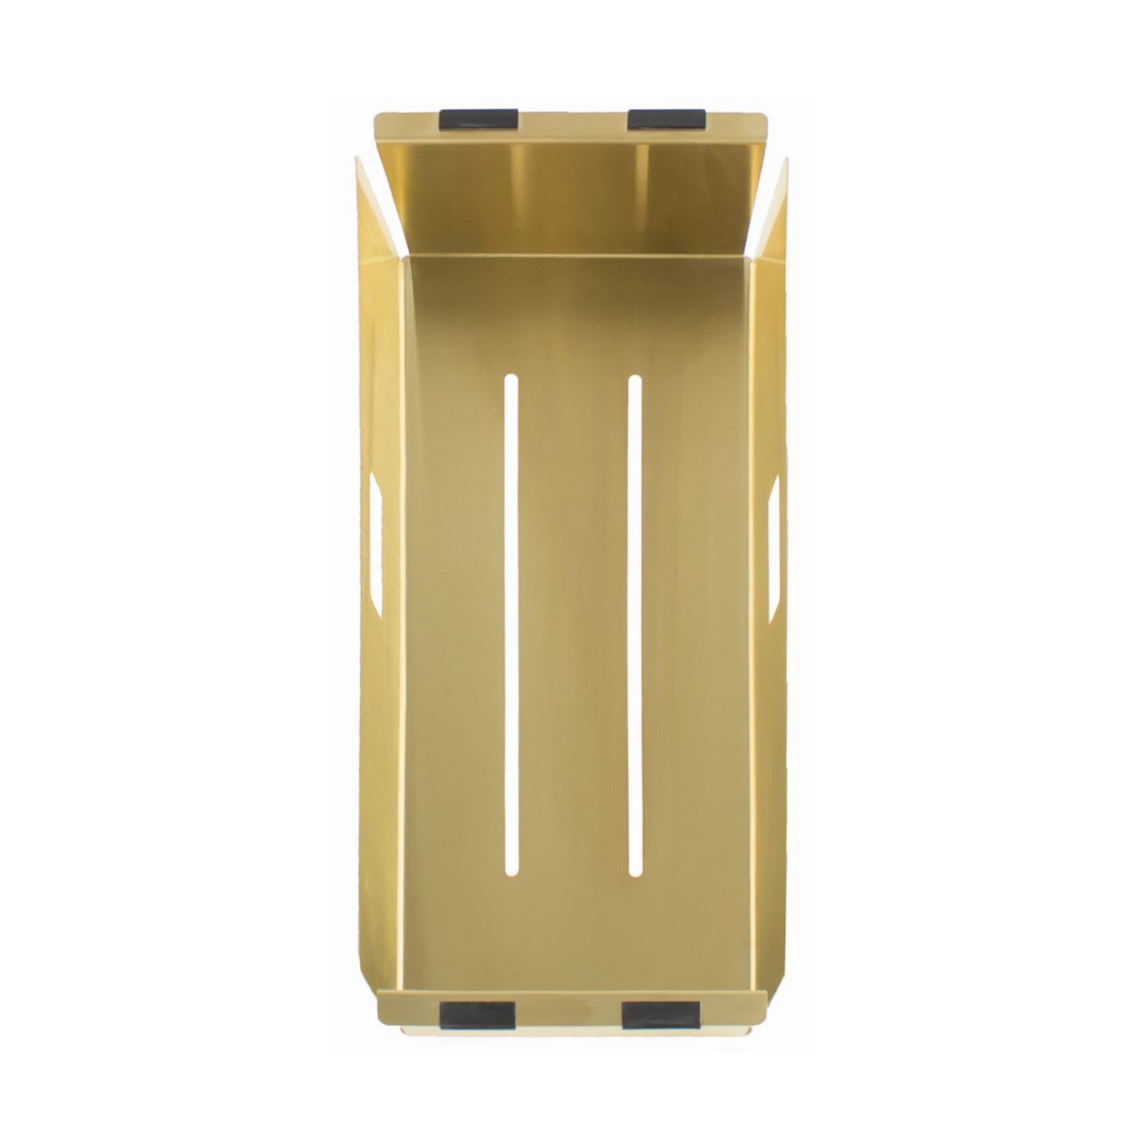 Reginox Miami Accessoire restenbak inzetbak rvs PVD Gold R3003 R30561